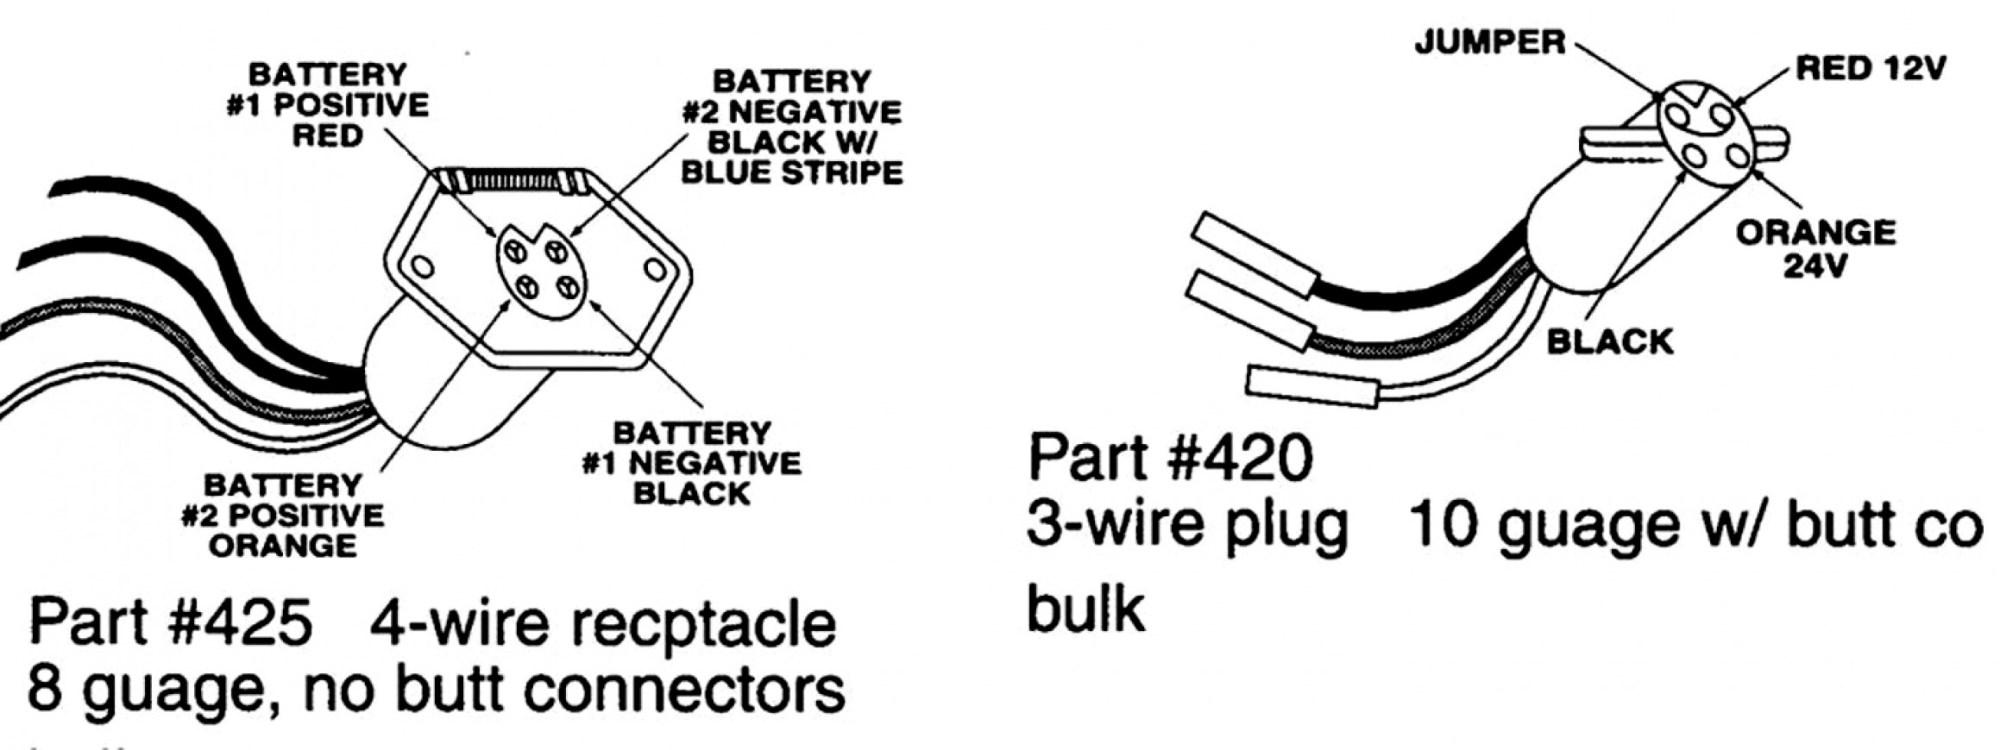 hight resolution of 12 24 volt trolling motor wiring diagram wiring diagram trolling motor wiring diagram